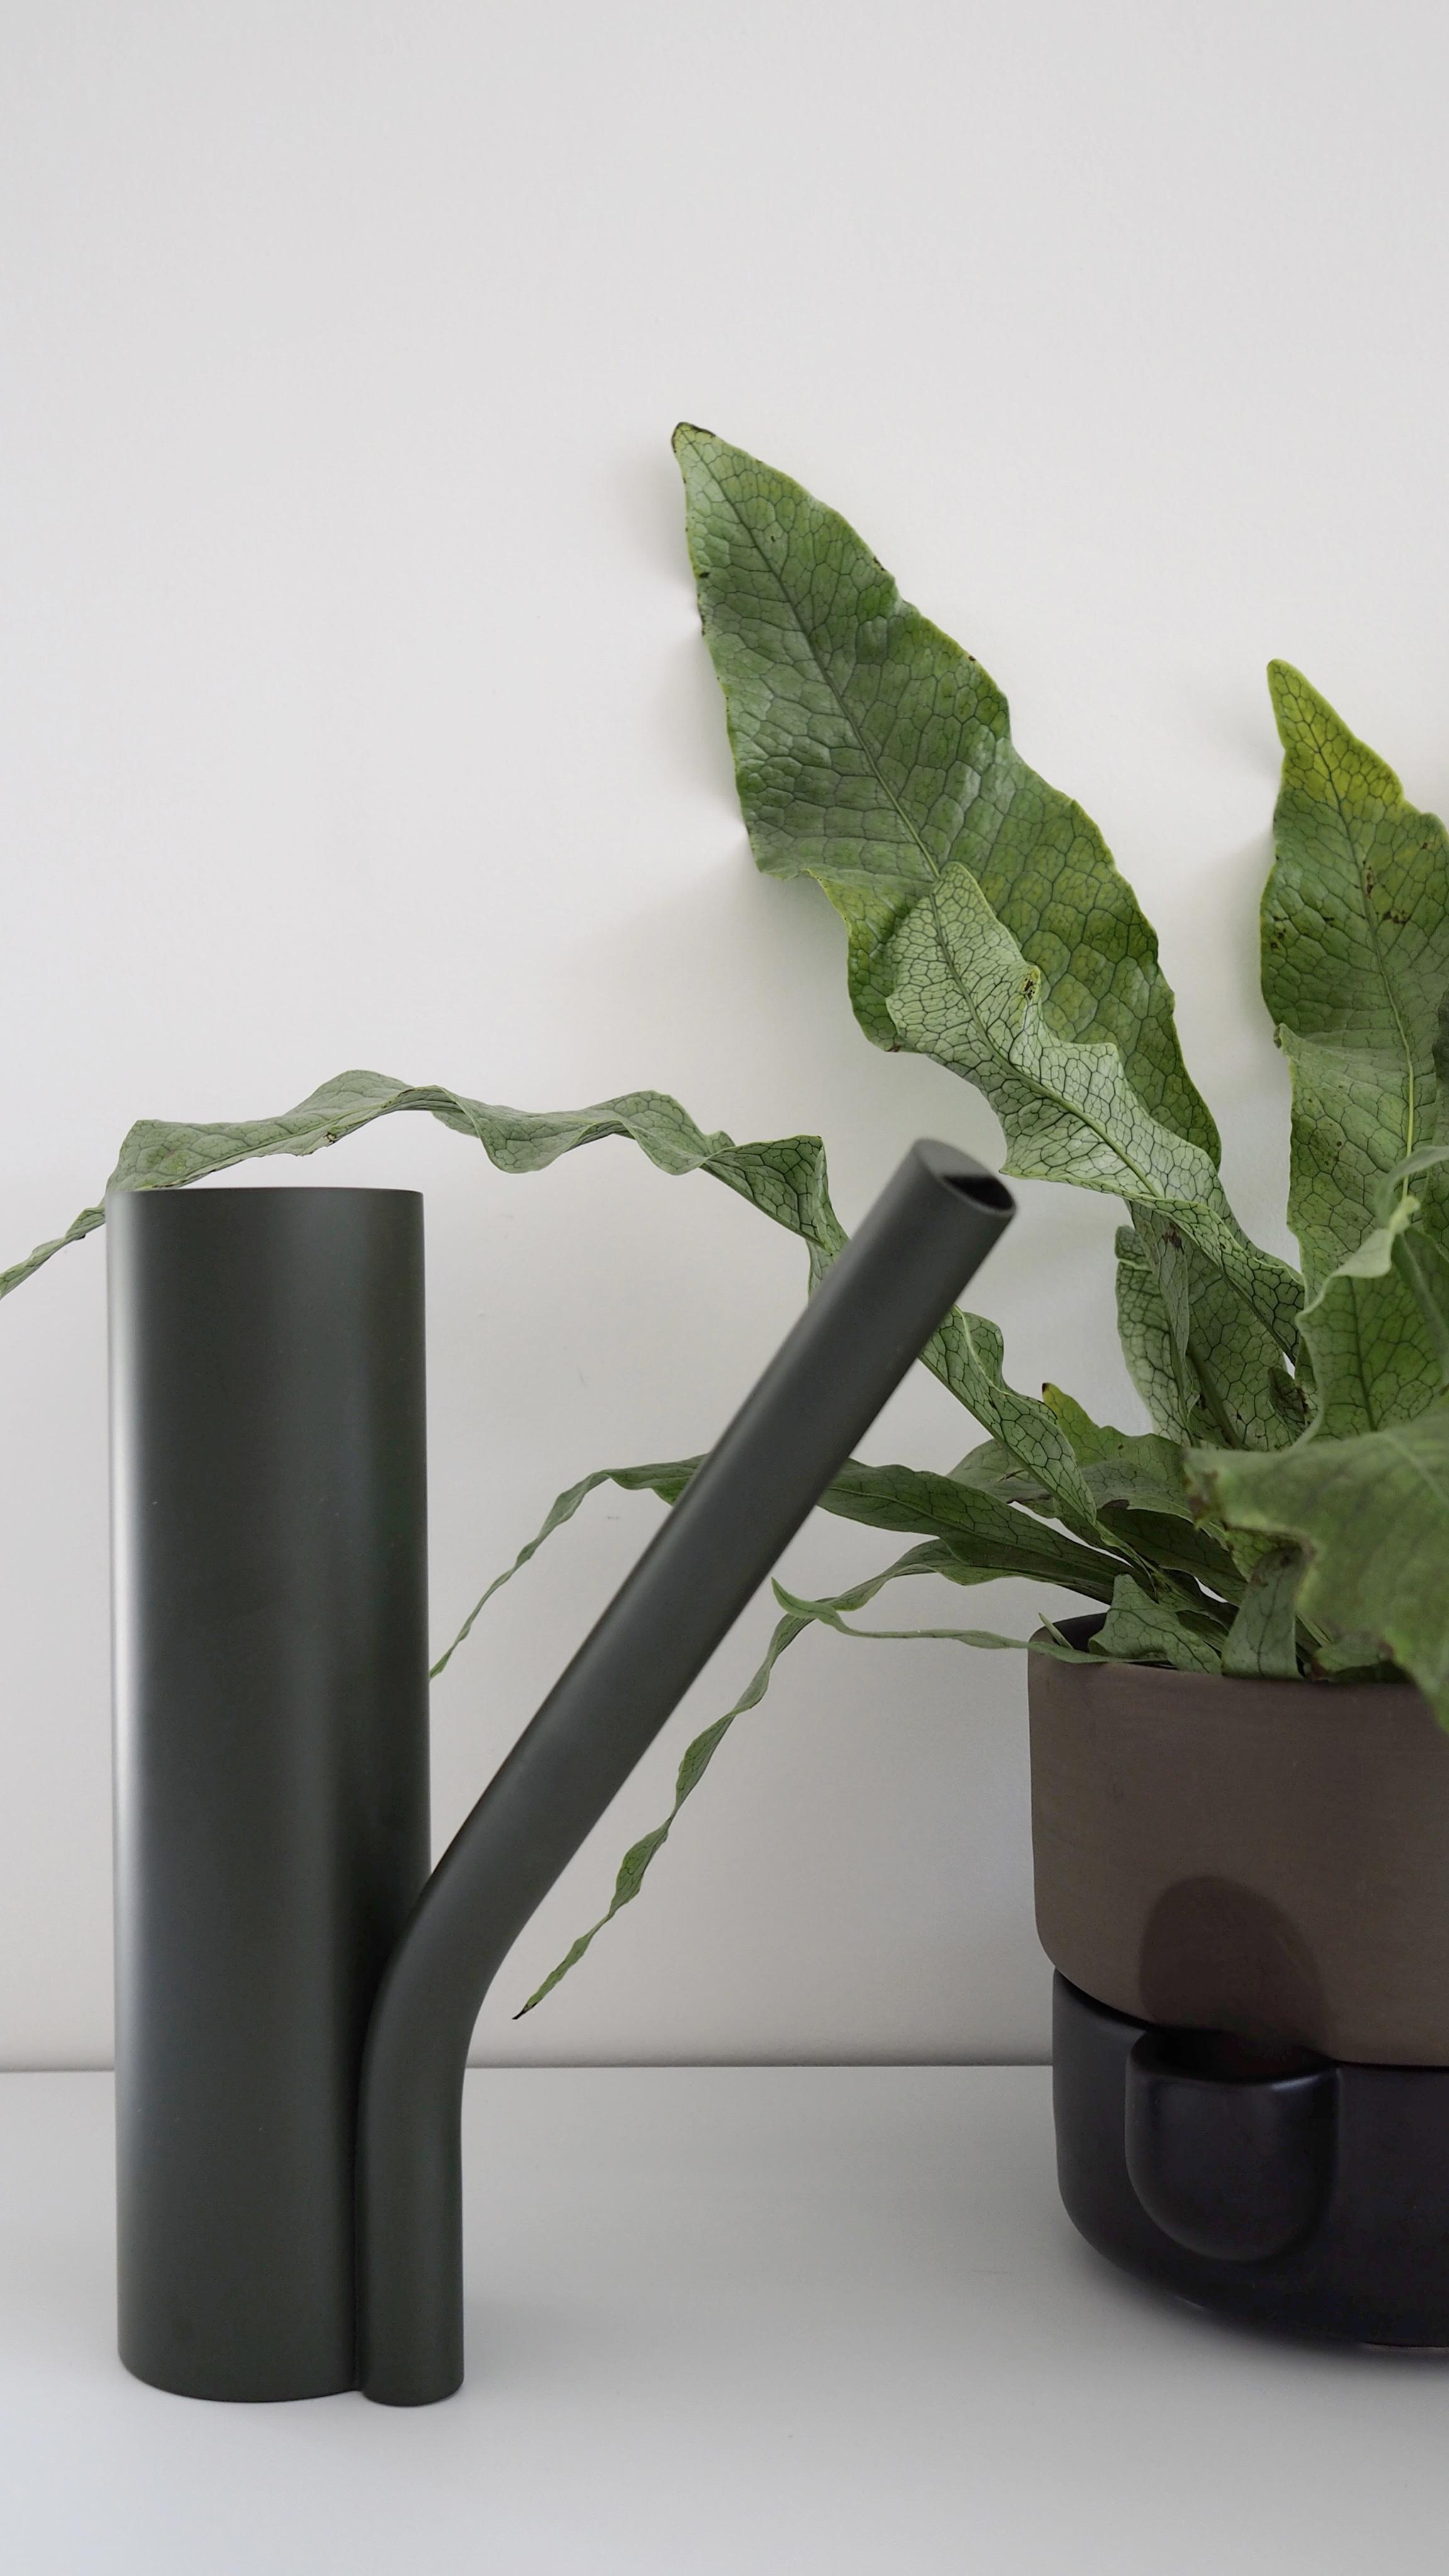 Northern_Oasis_self-watering_flowerpot_Grab_Holiday-Care-for-Houseplants_Nicola_Capper.jpg